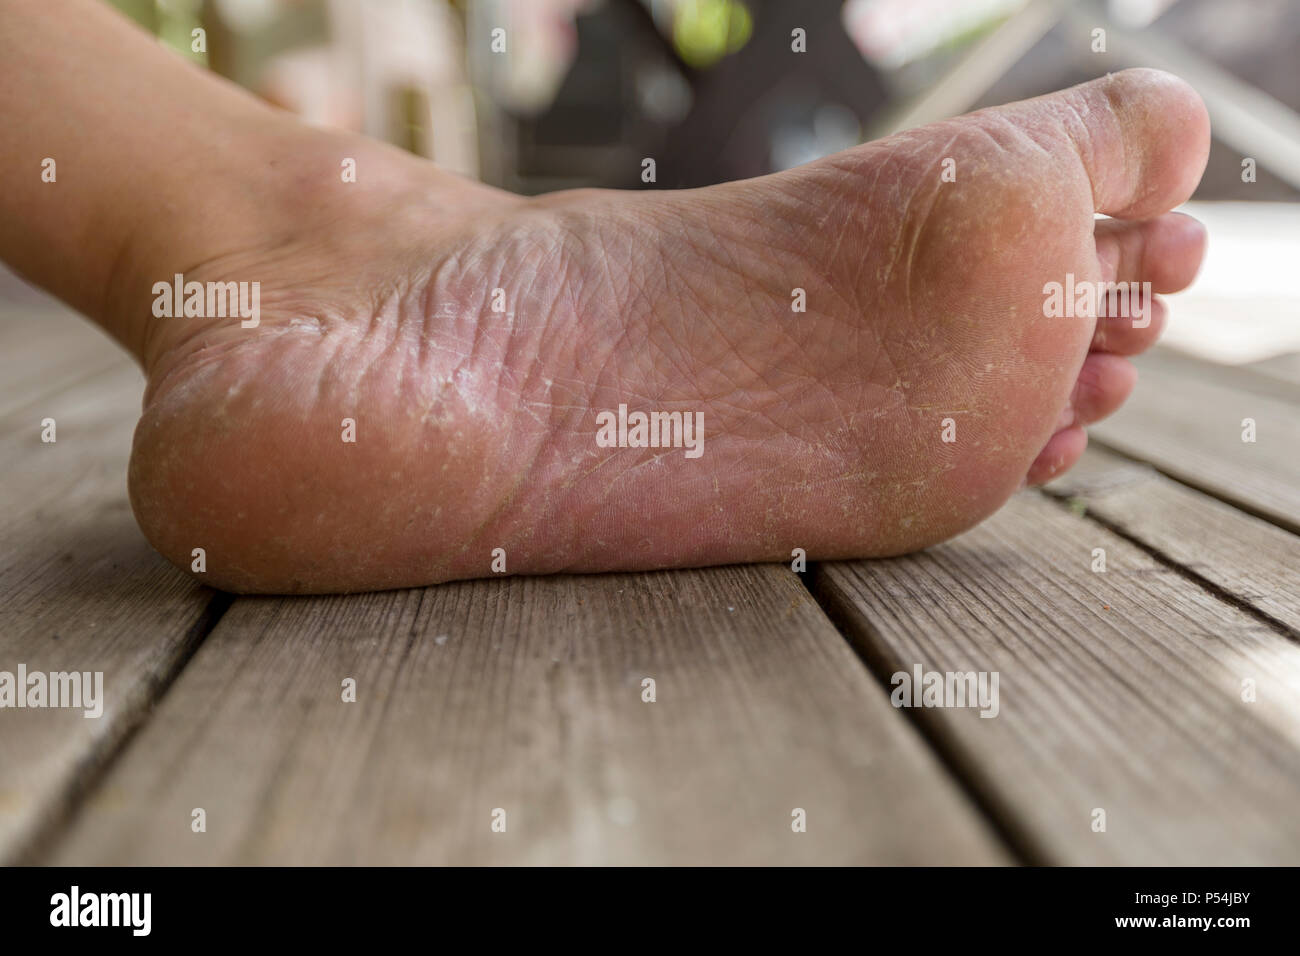 Athletes Foot High Resolution Stock